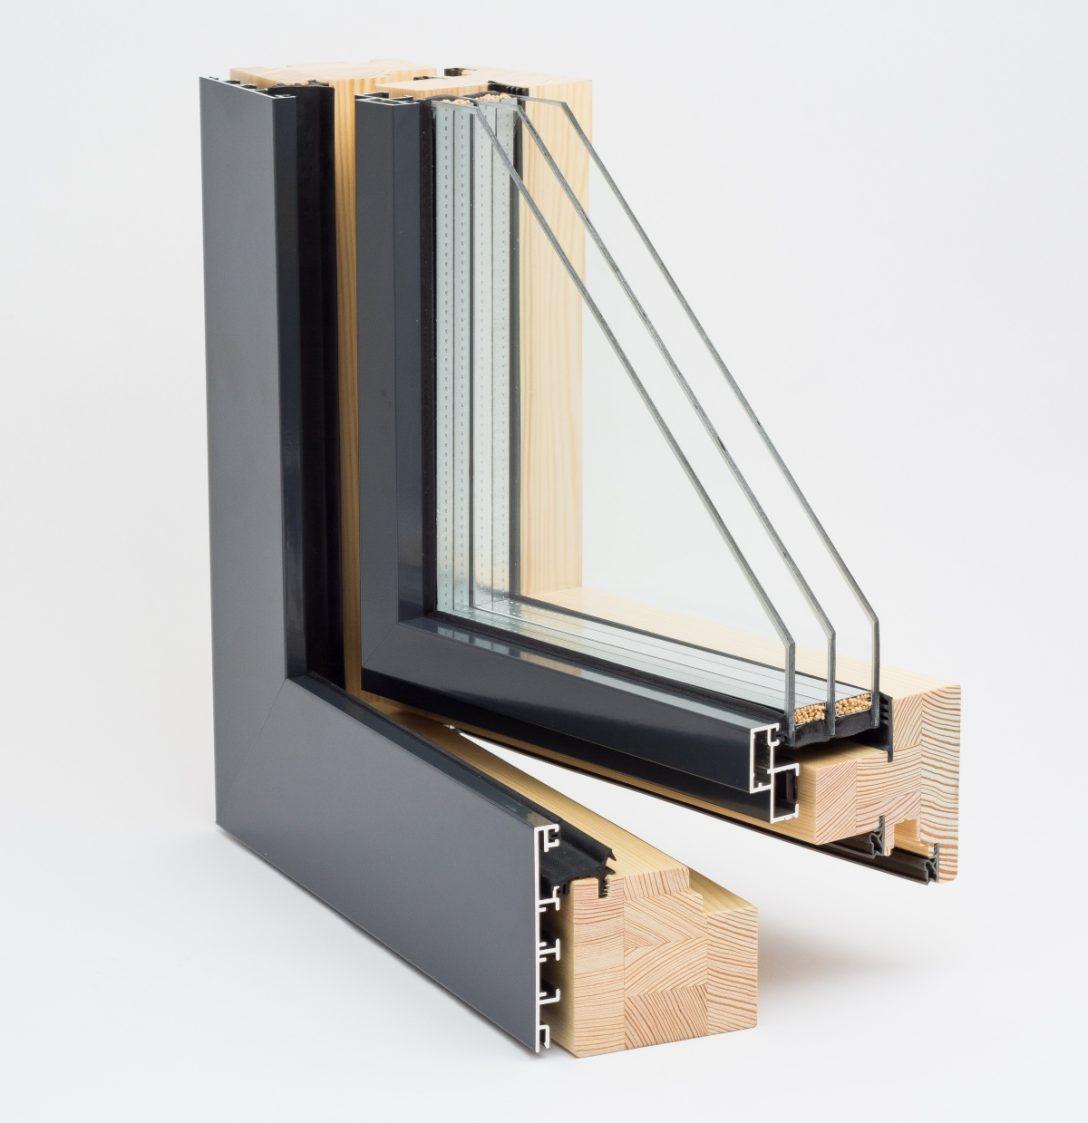 Unilux Holz Alu Fenster Preise Preisliste Aluminium Erfahrungen